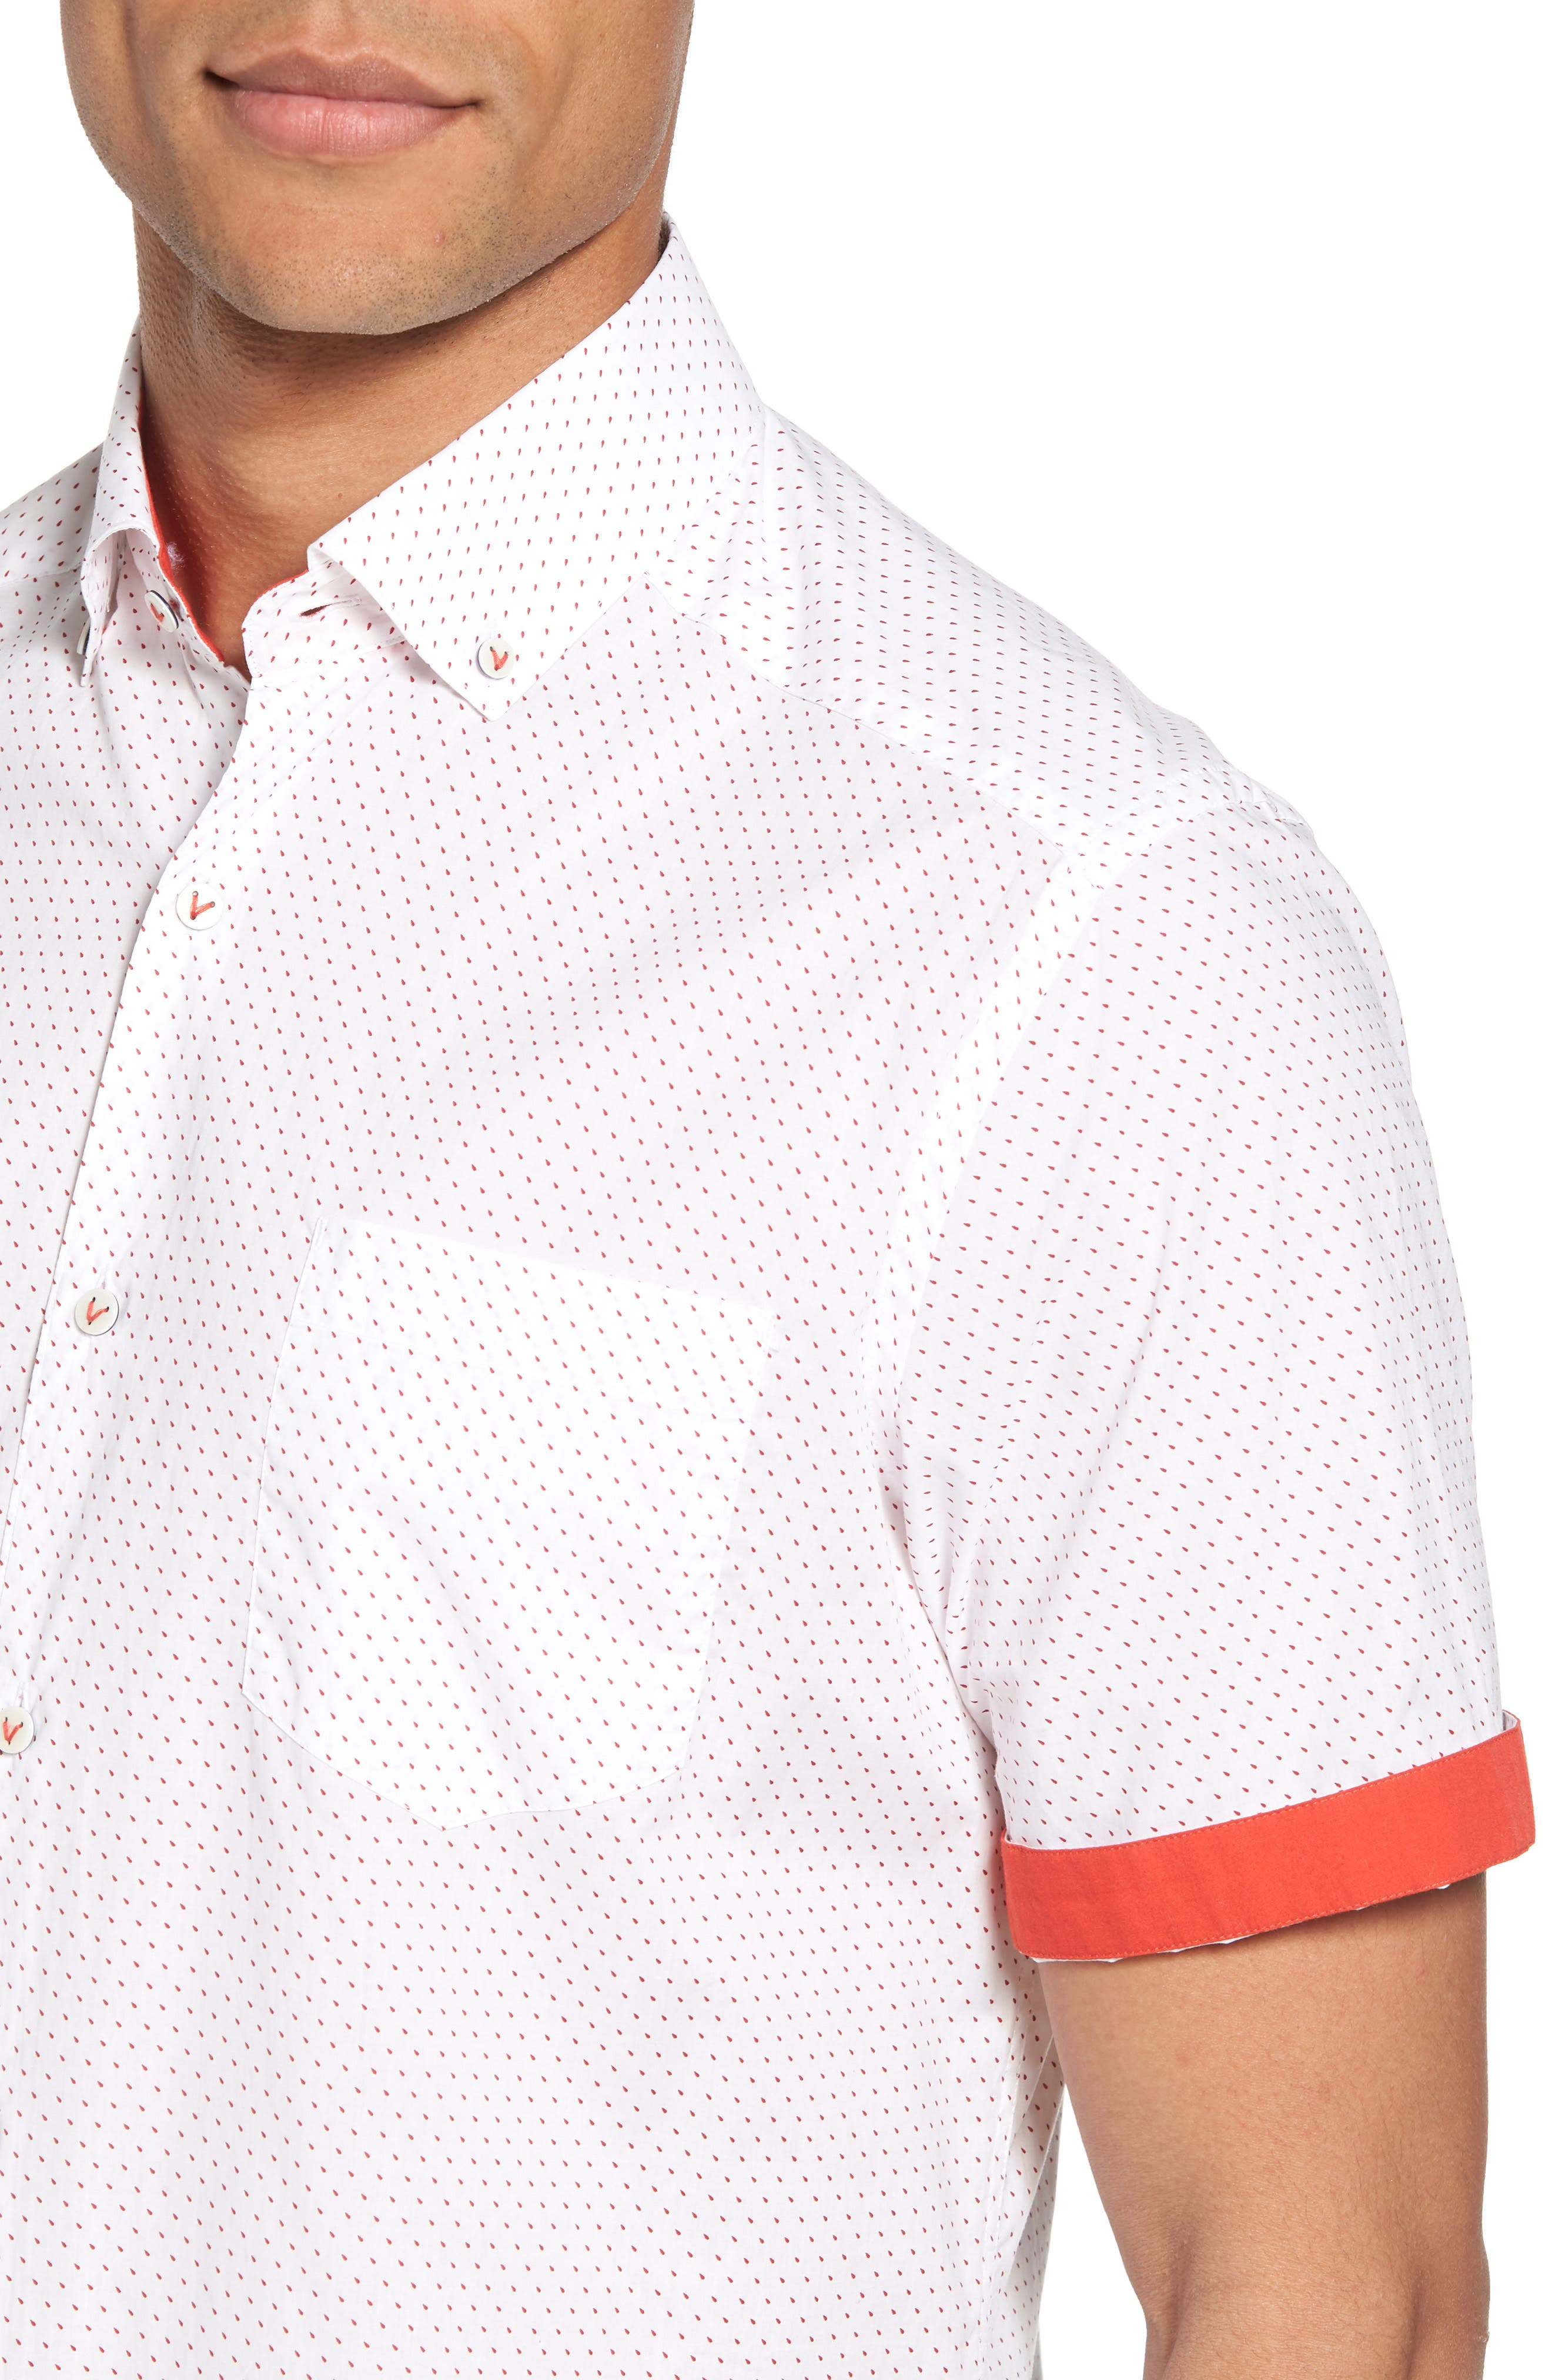 Dot Print Shirt,                             Alternate thumbnail 2, color,                             Canvas / Red Coral